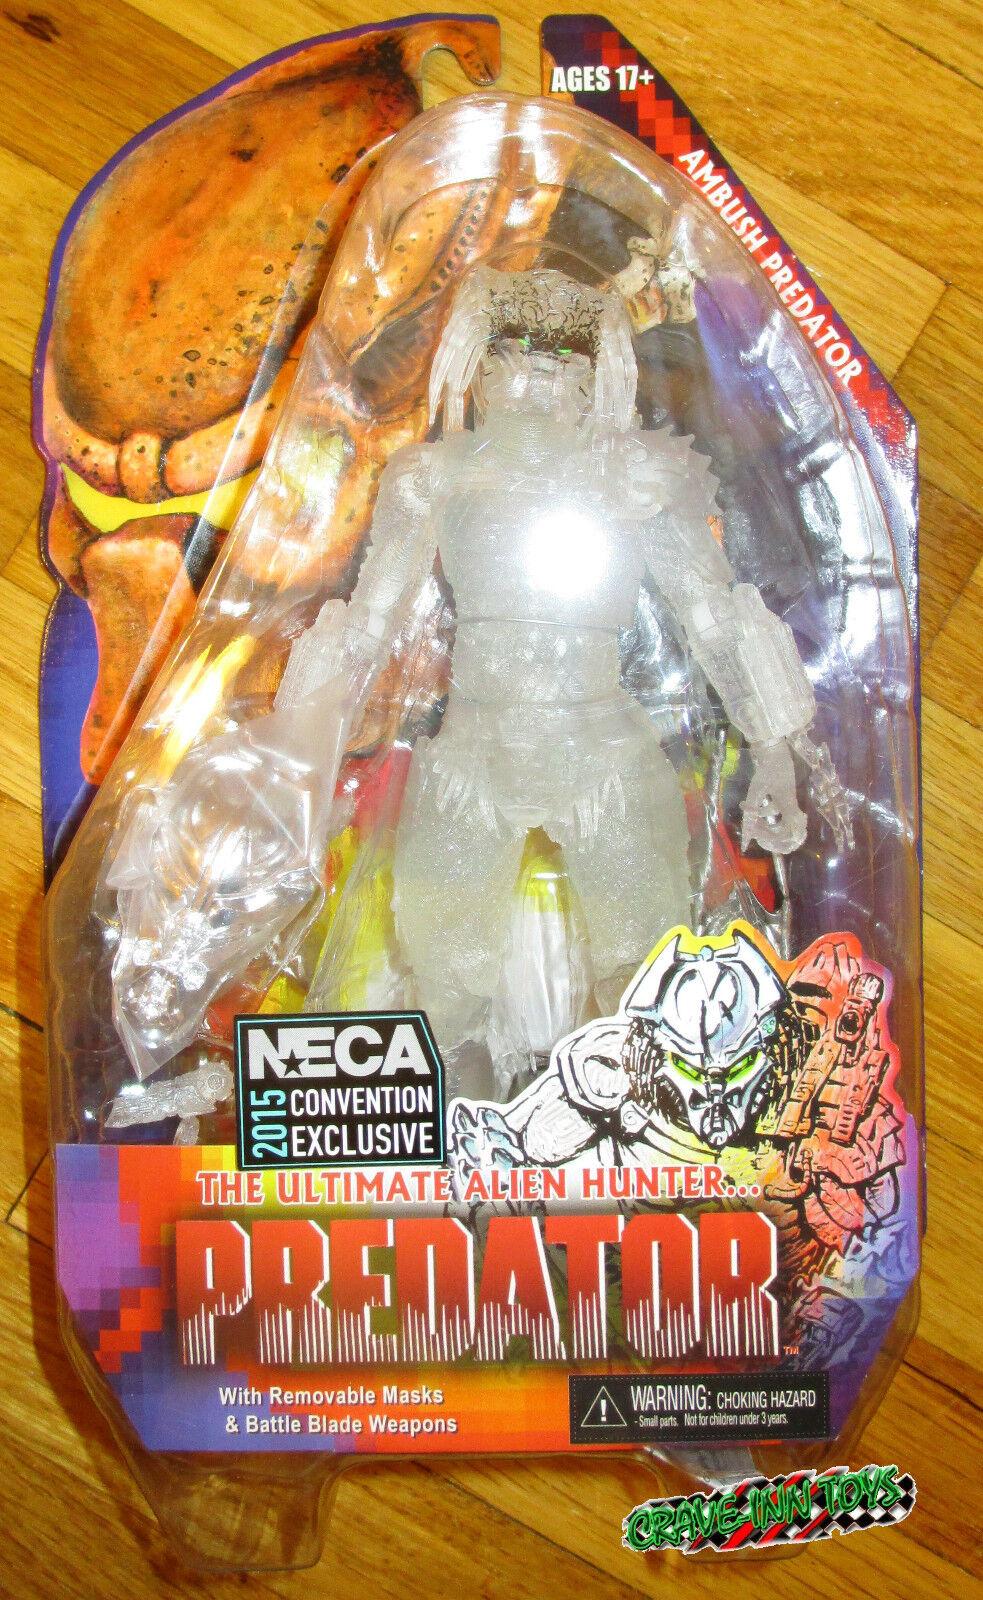 entrega gratis Sdcc 2015 Figura De Neca emboscada emboscada emboscada Projoator 7  exclusivo de armadura clara  mas preferencial